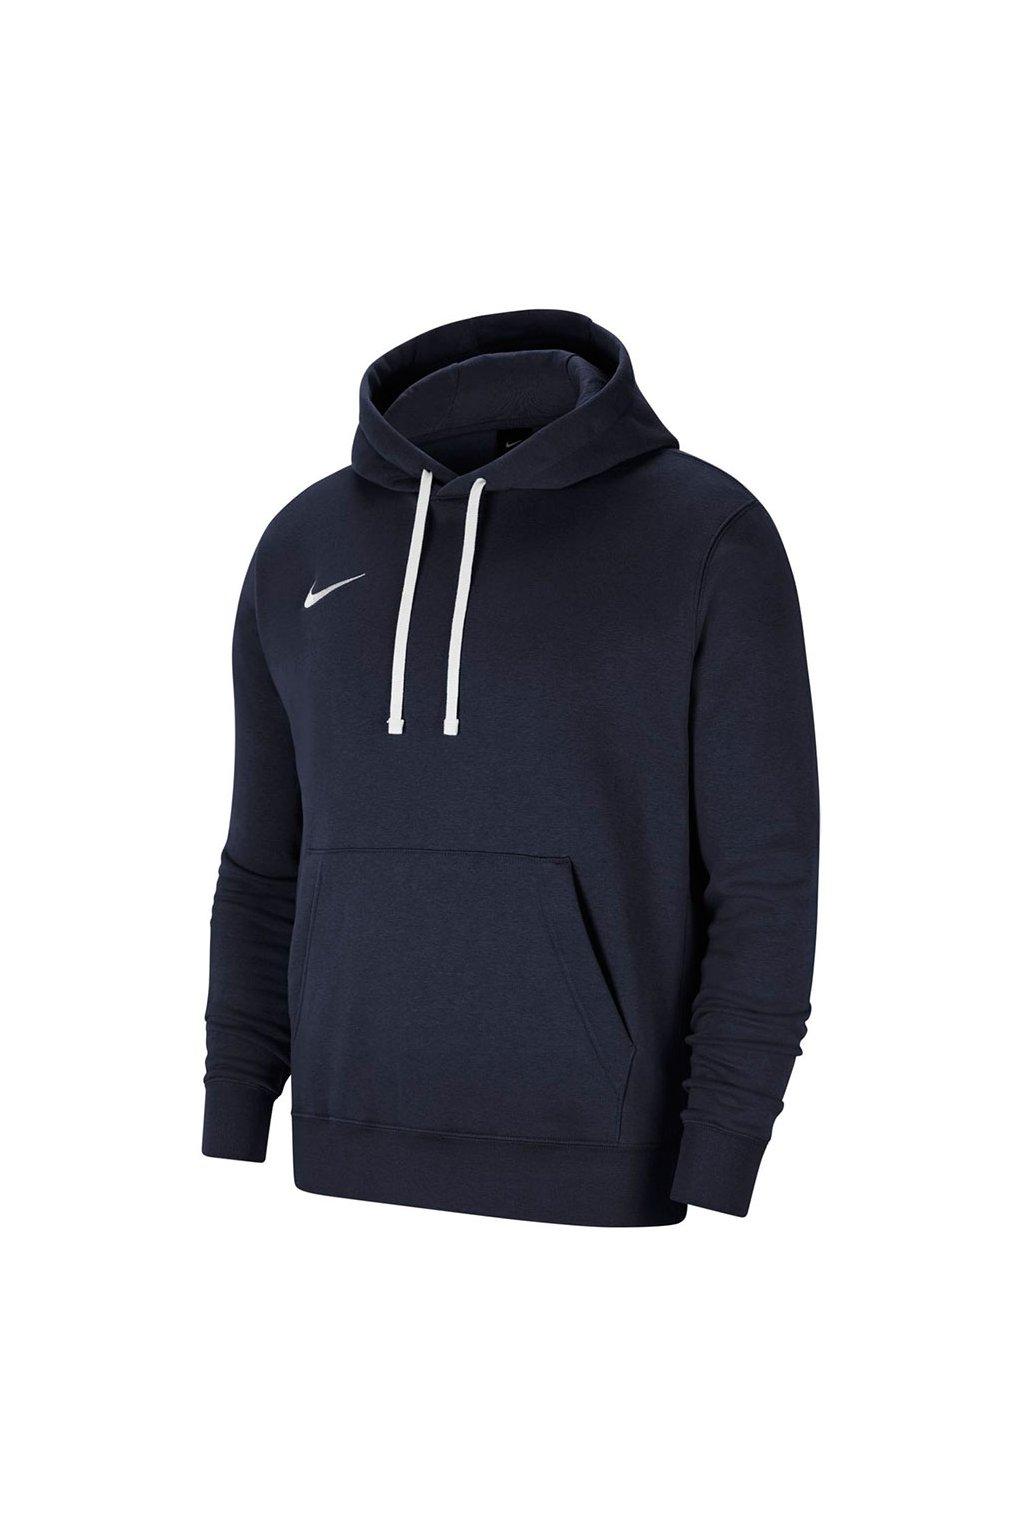 Dámska mikina Nike Park 20 Hoodie tmavomodrá CW6957 451